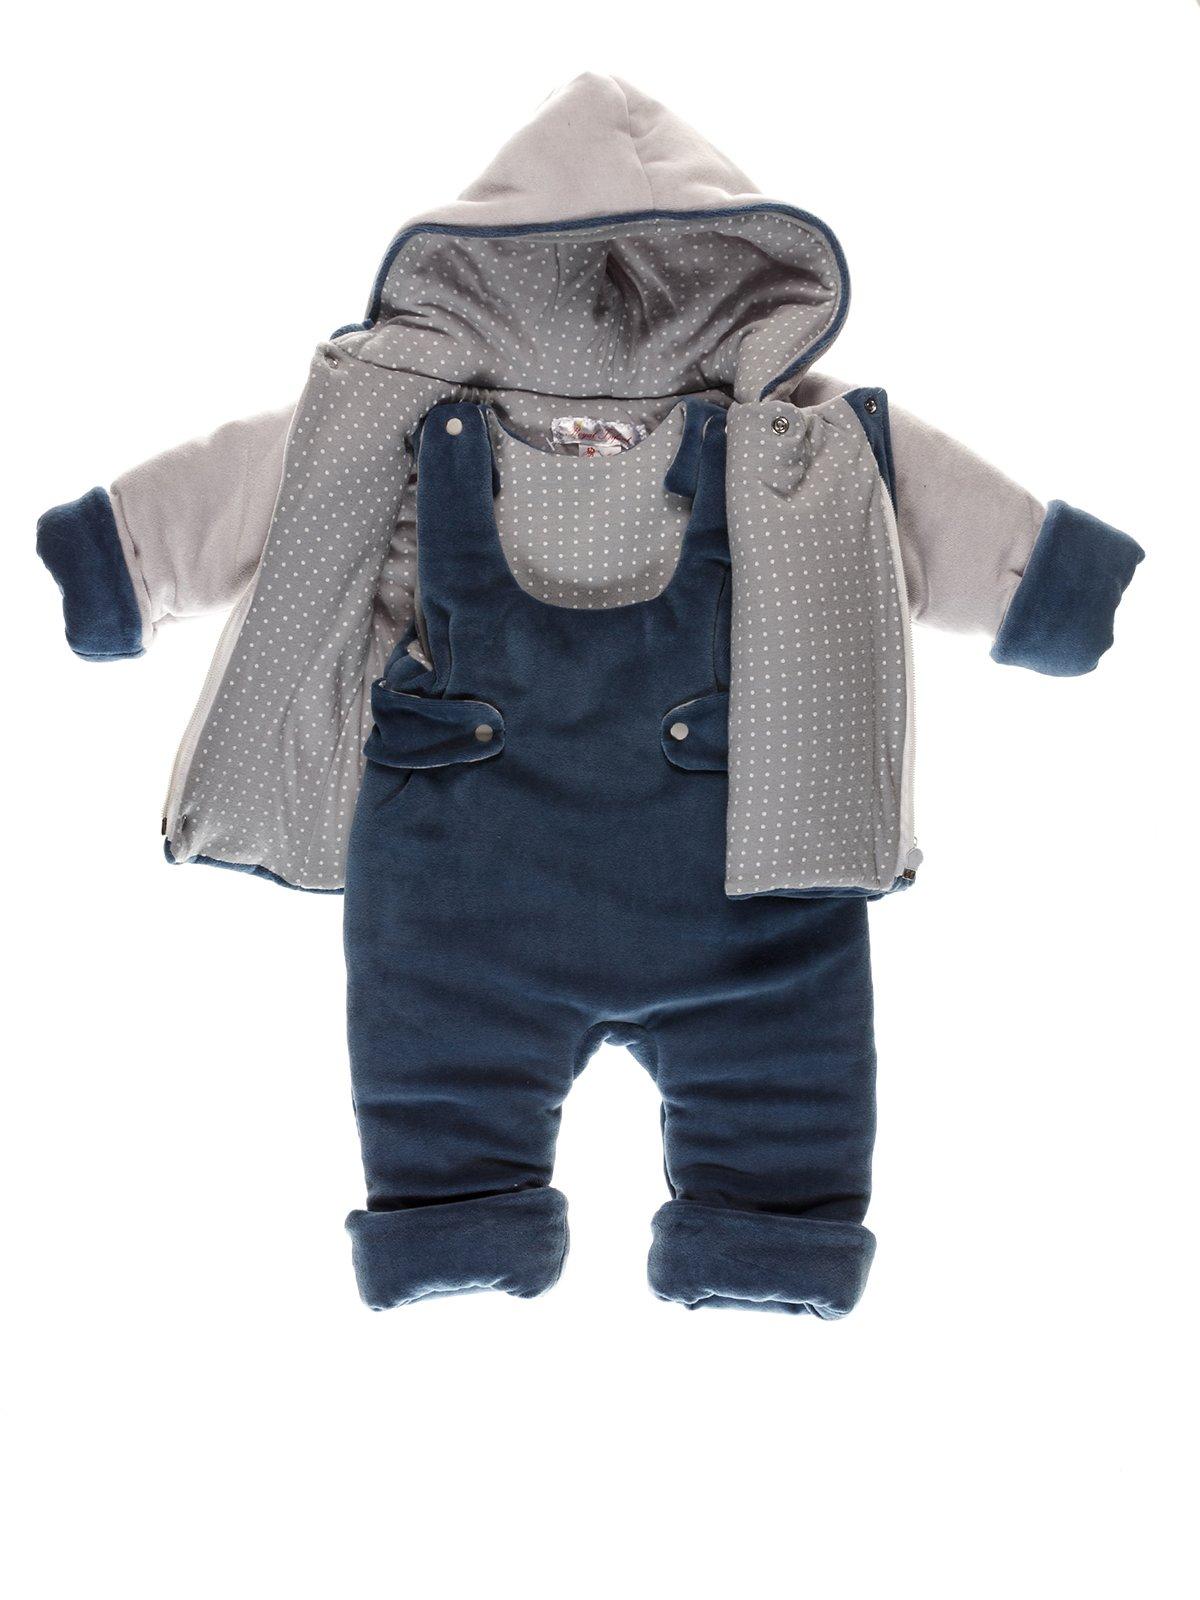 Комплект: куртка и комбинезон | 3742099 | фото 2